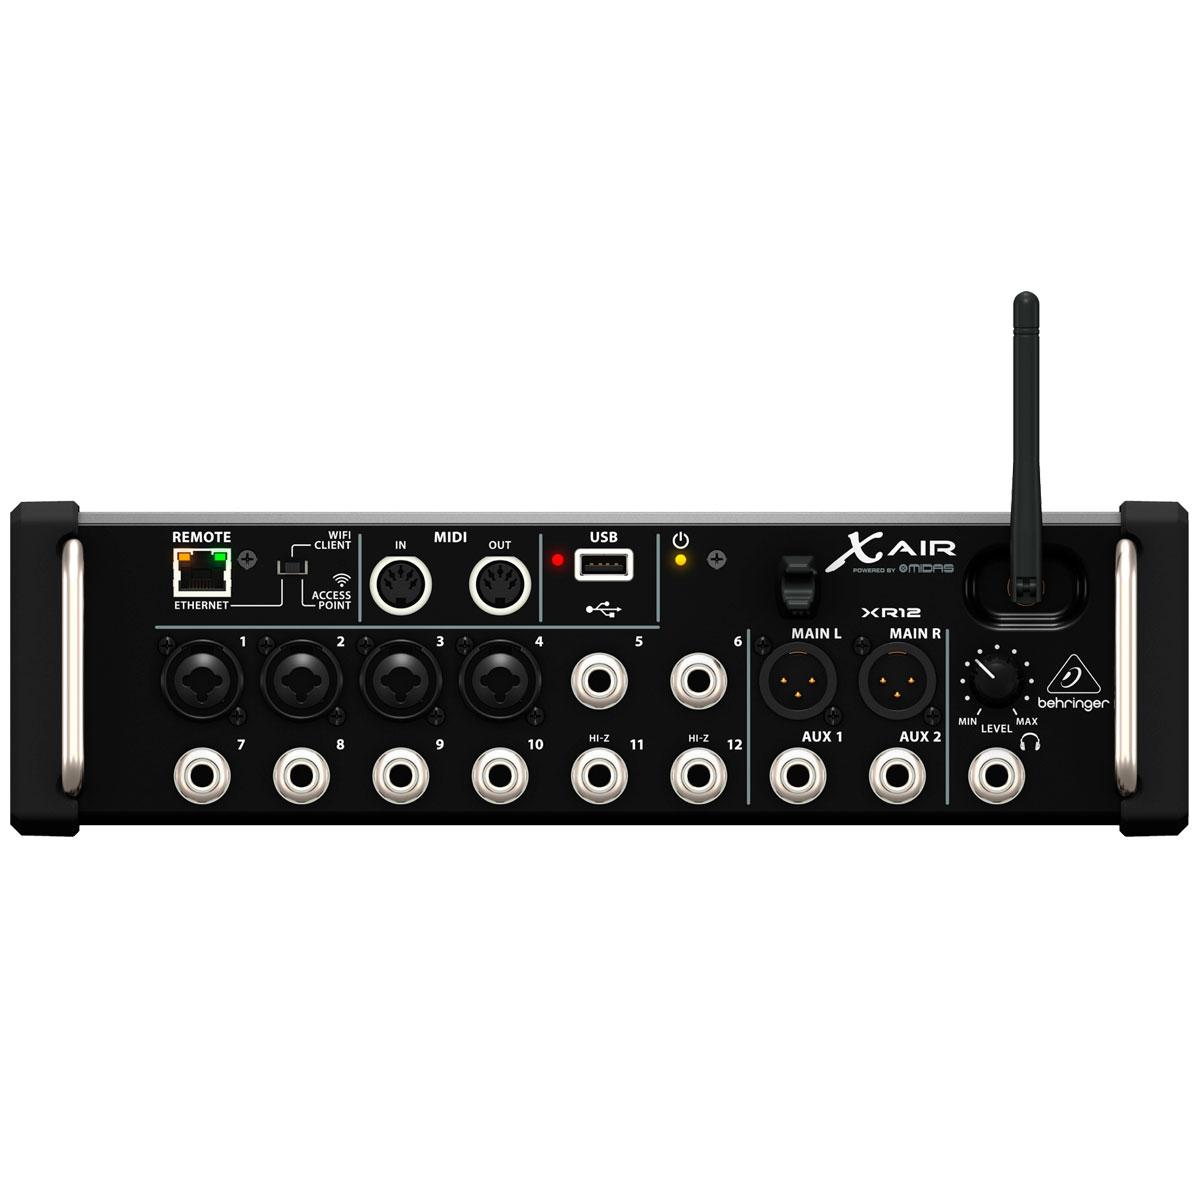 Mesa de Som 12 Canais Balanceados (4 XLR + 8 P10) c/ USB / MIDI / Efeito / Phantom / 6 Auxiliares - X AIR XR 12 Behringer